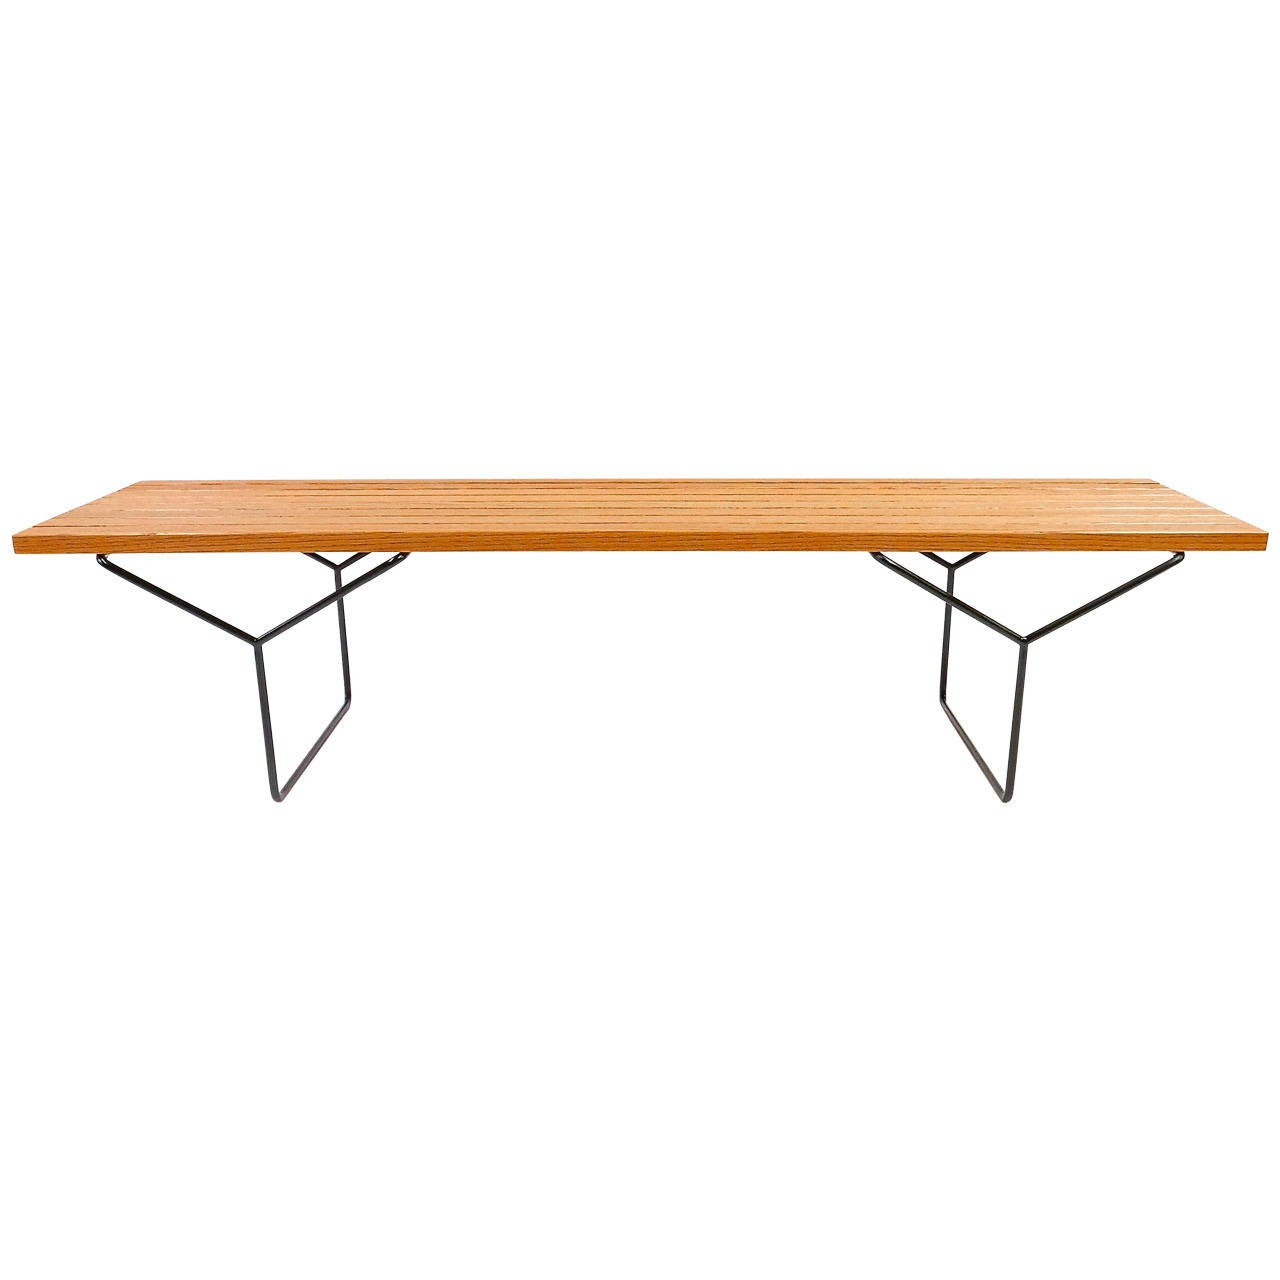 Harry bertoia bench knoll associates at 1stdibs - Bertoia coffee table ...